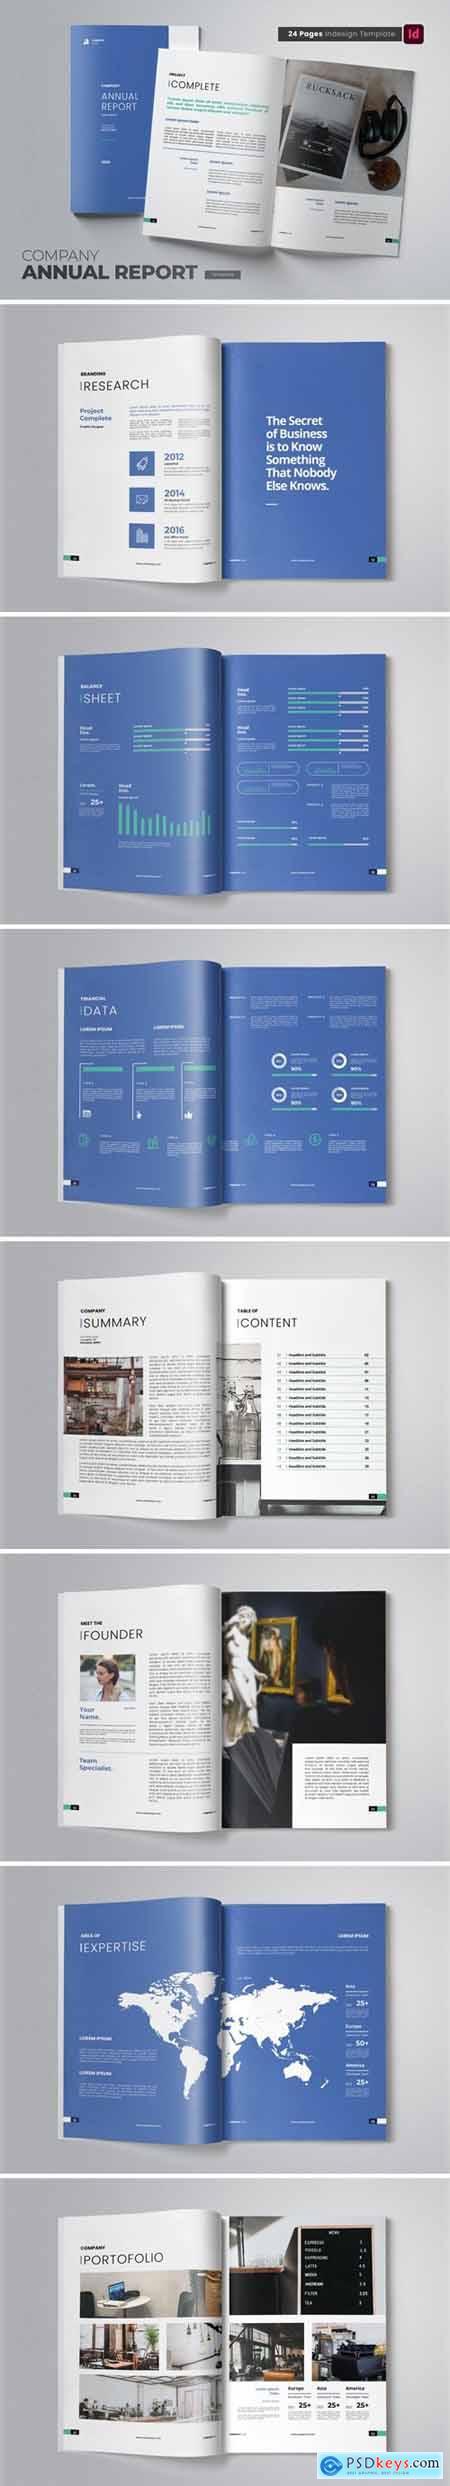 Annual Report367